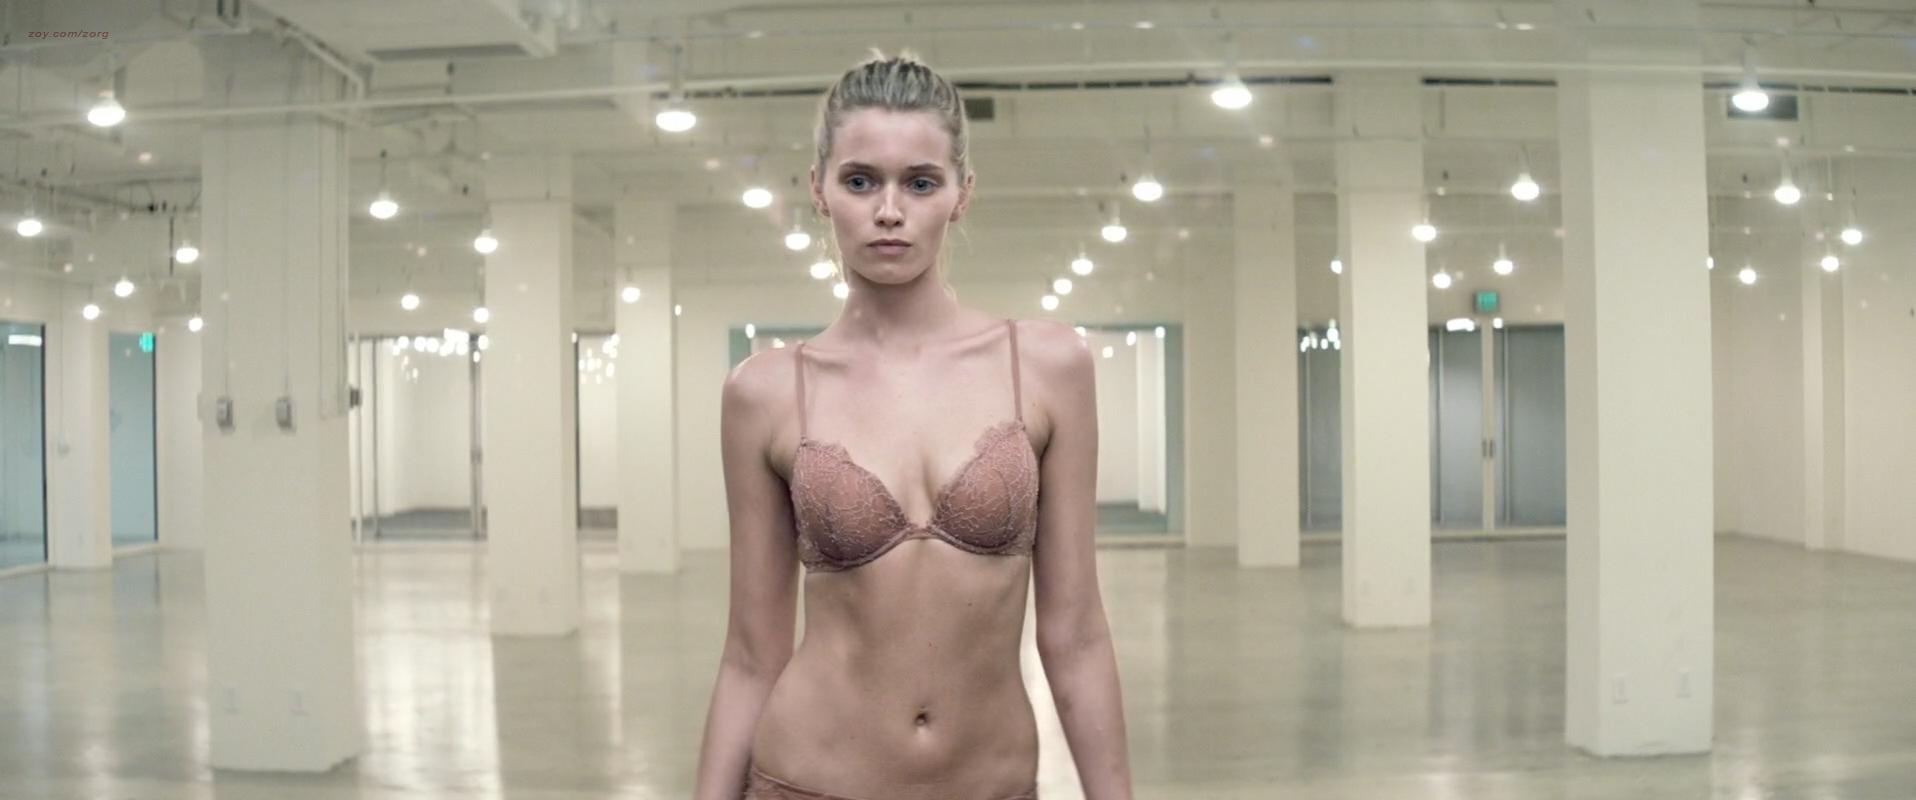 Elle Fanning hot Jena Malone, Bella Heathcote and Abbey Lee nude, topless, bush- The Neon Demon (2016) 1080p WEB-DL (12)